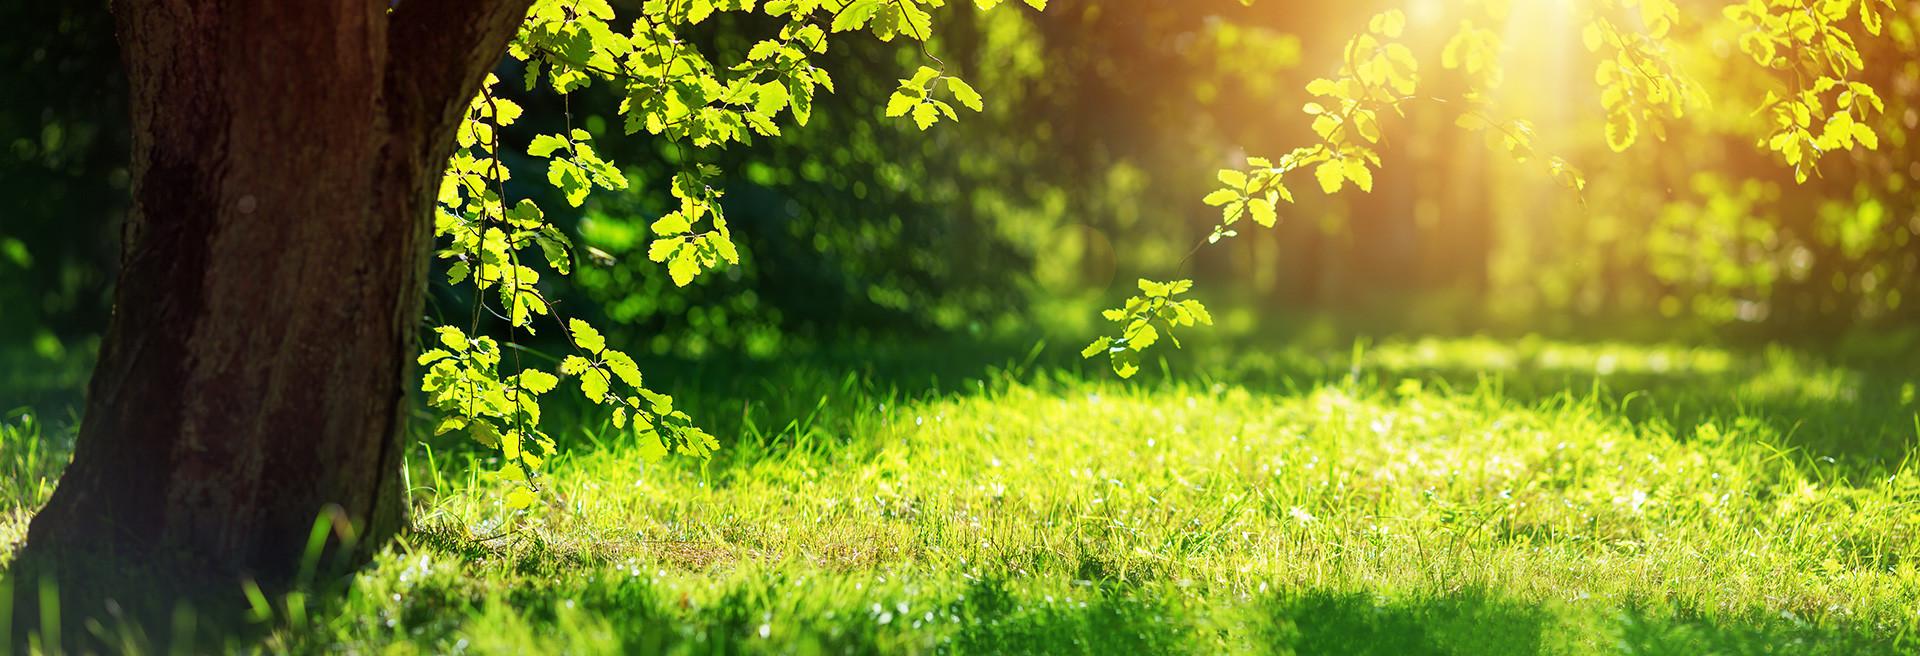 karton-green-vision.jpg